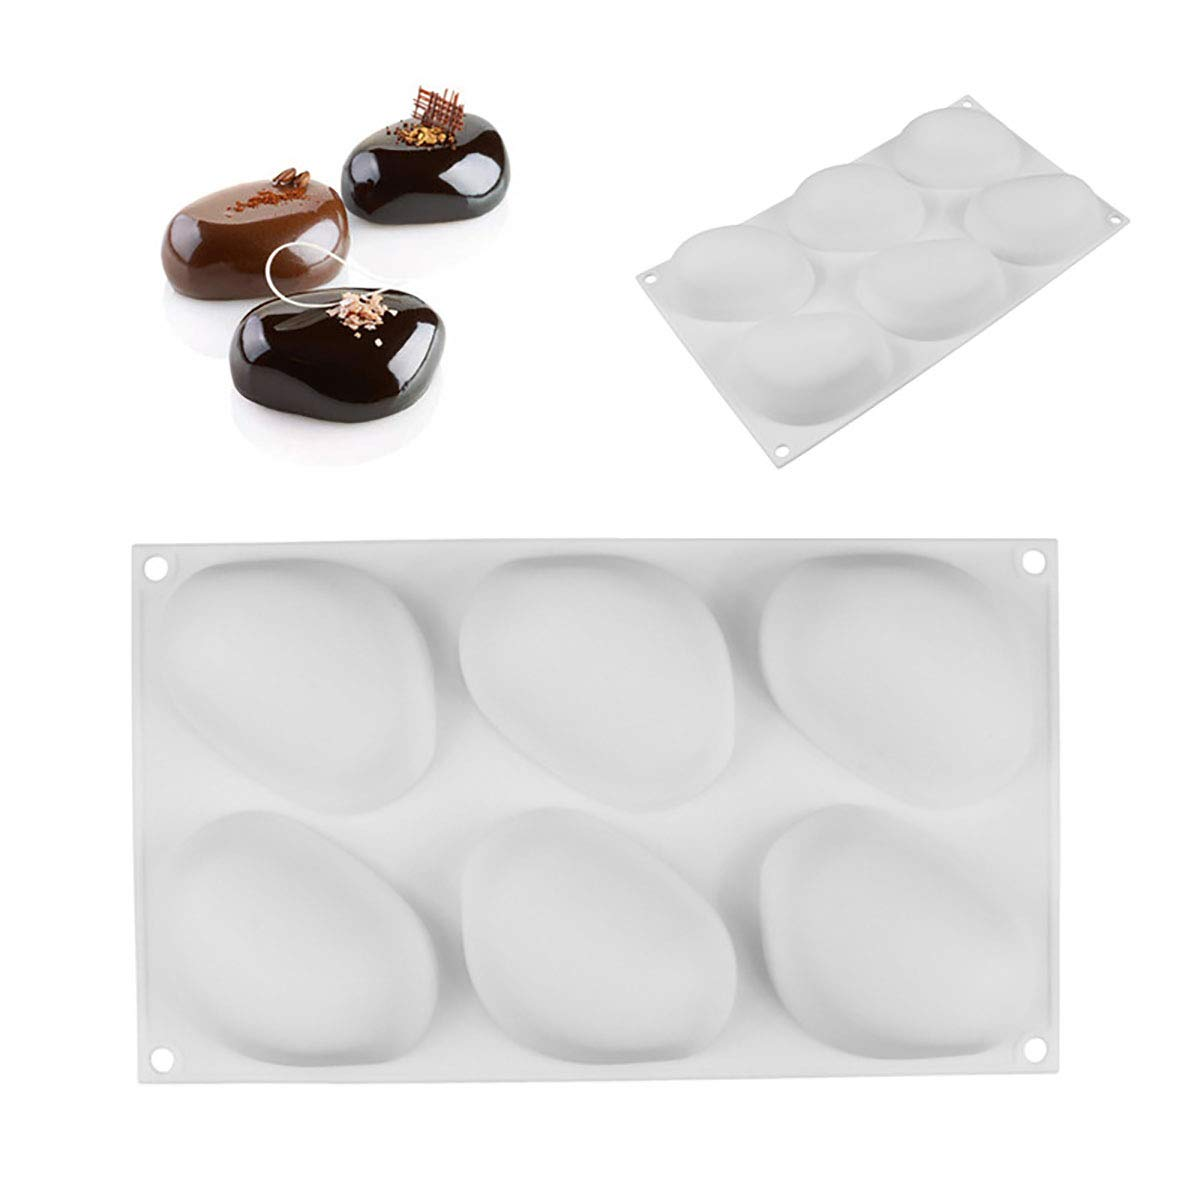 1 Pcs Silicone Elliptical Pebble Stone Baking Pan Cakes Mousse Dessert Mold